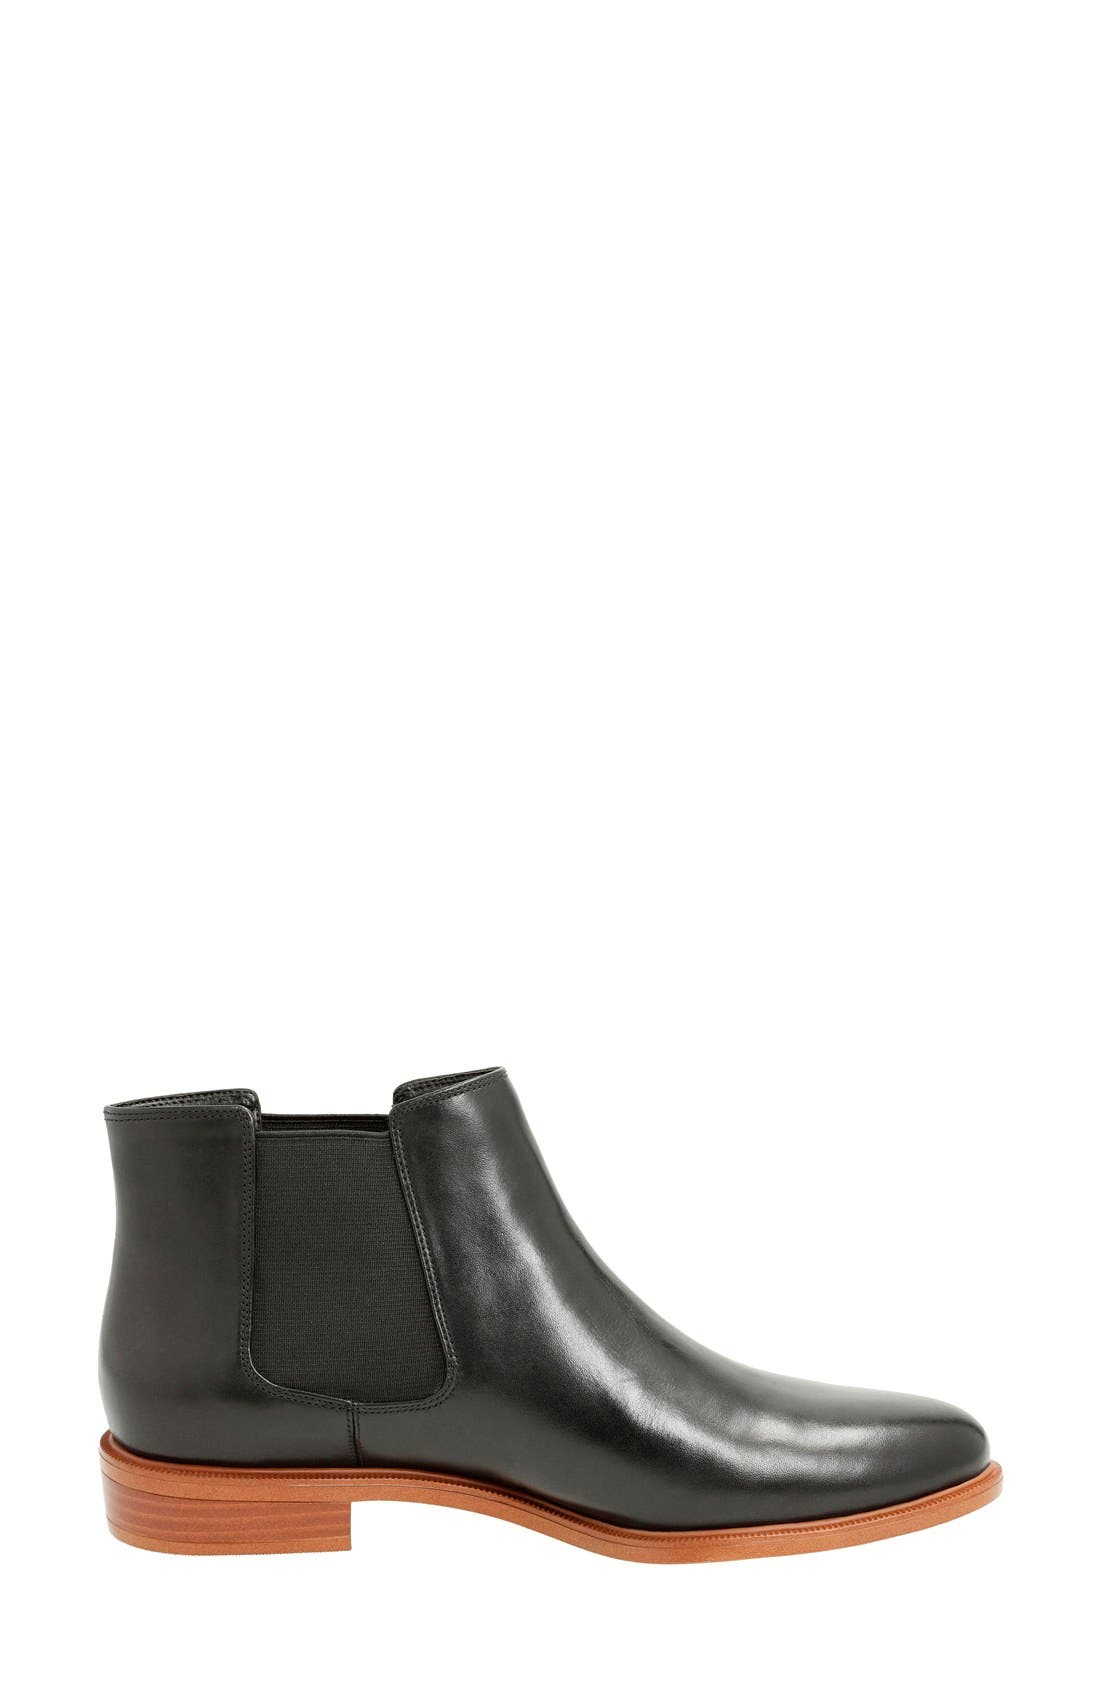 'Taylor Shine' Chelsea Boot,                             Alternate thumbnail 2, color,                             Black Leather